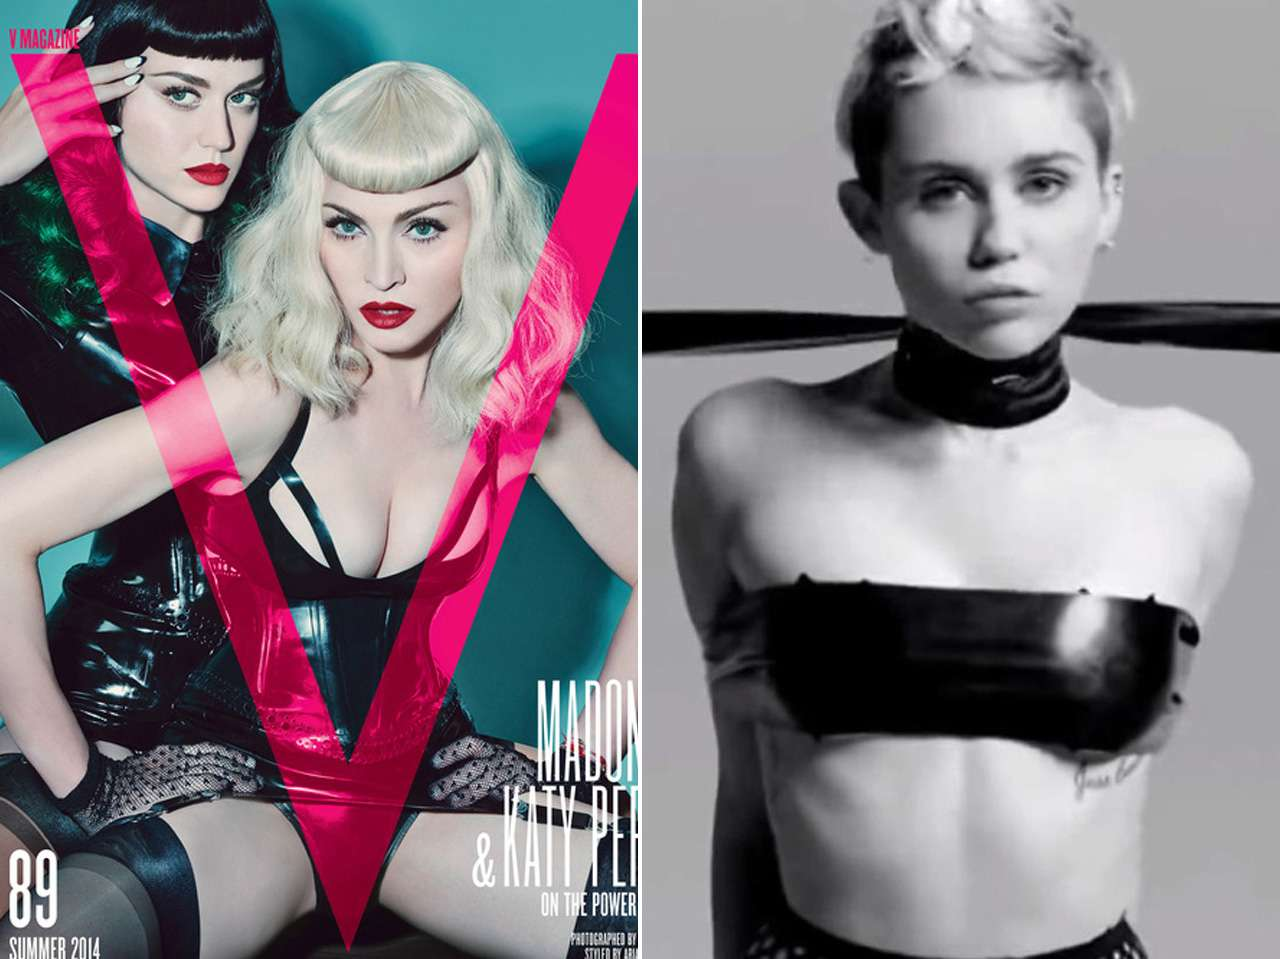 Katy Perry, Madonna y Miley Cyrus. Foto: V Magazine / You Tube